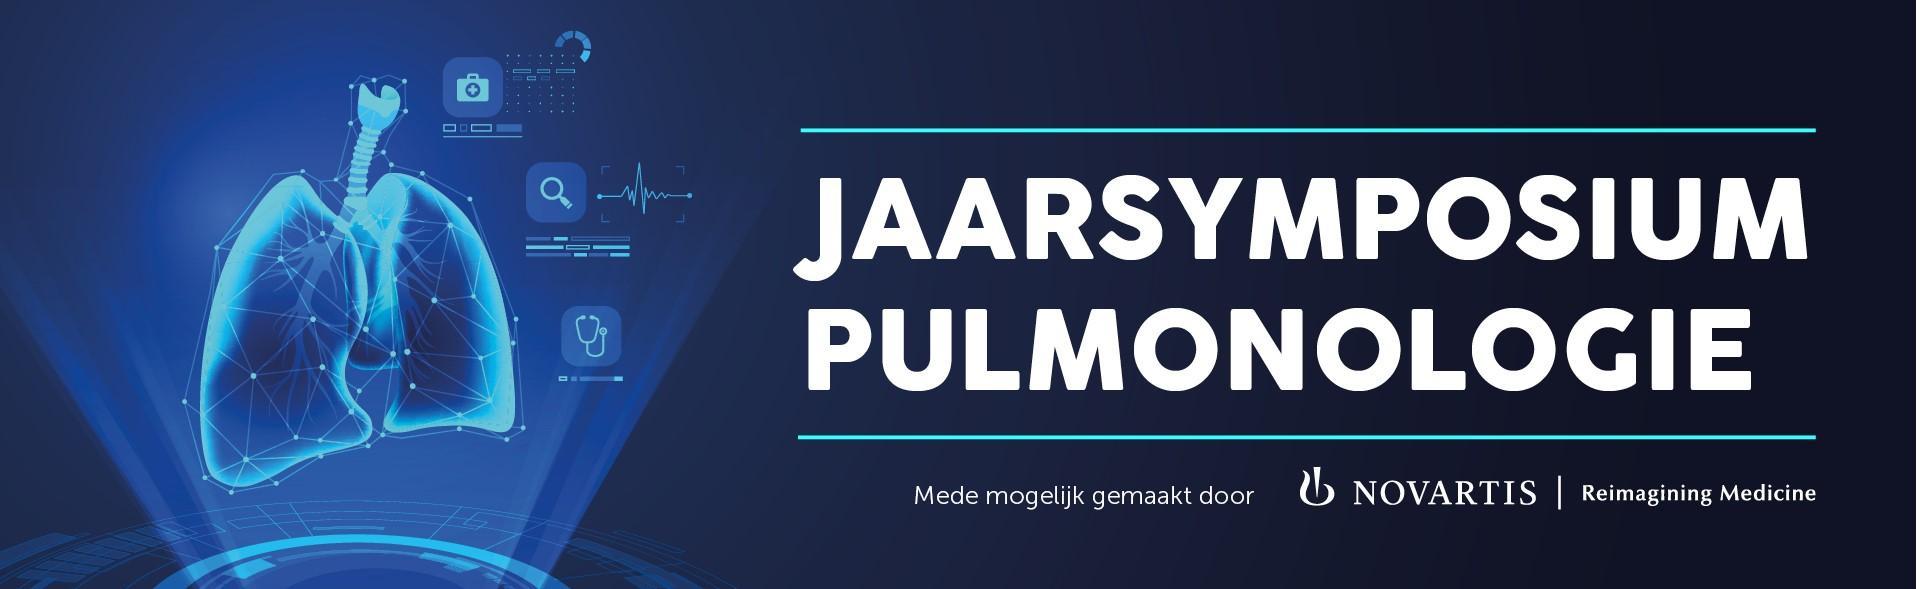 Digitaal congresverslag 14e Jaarsymposium Pulmonologie